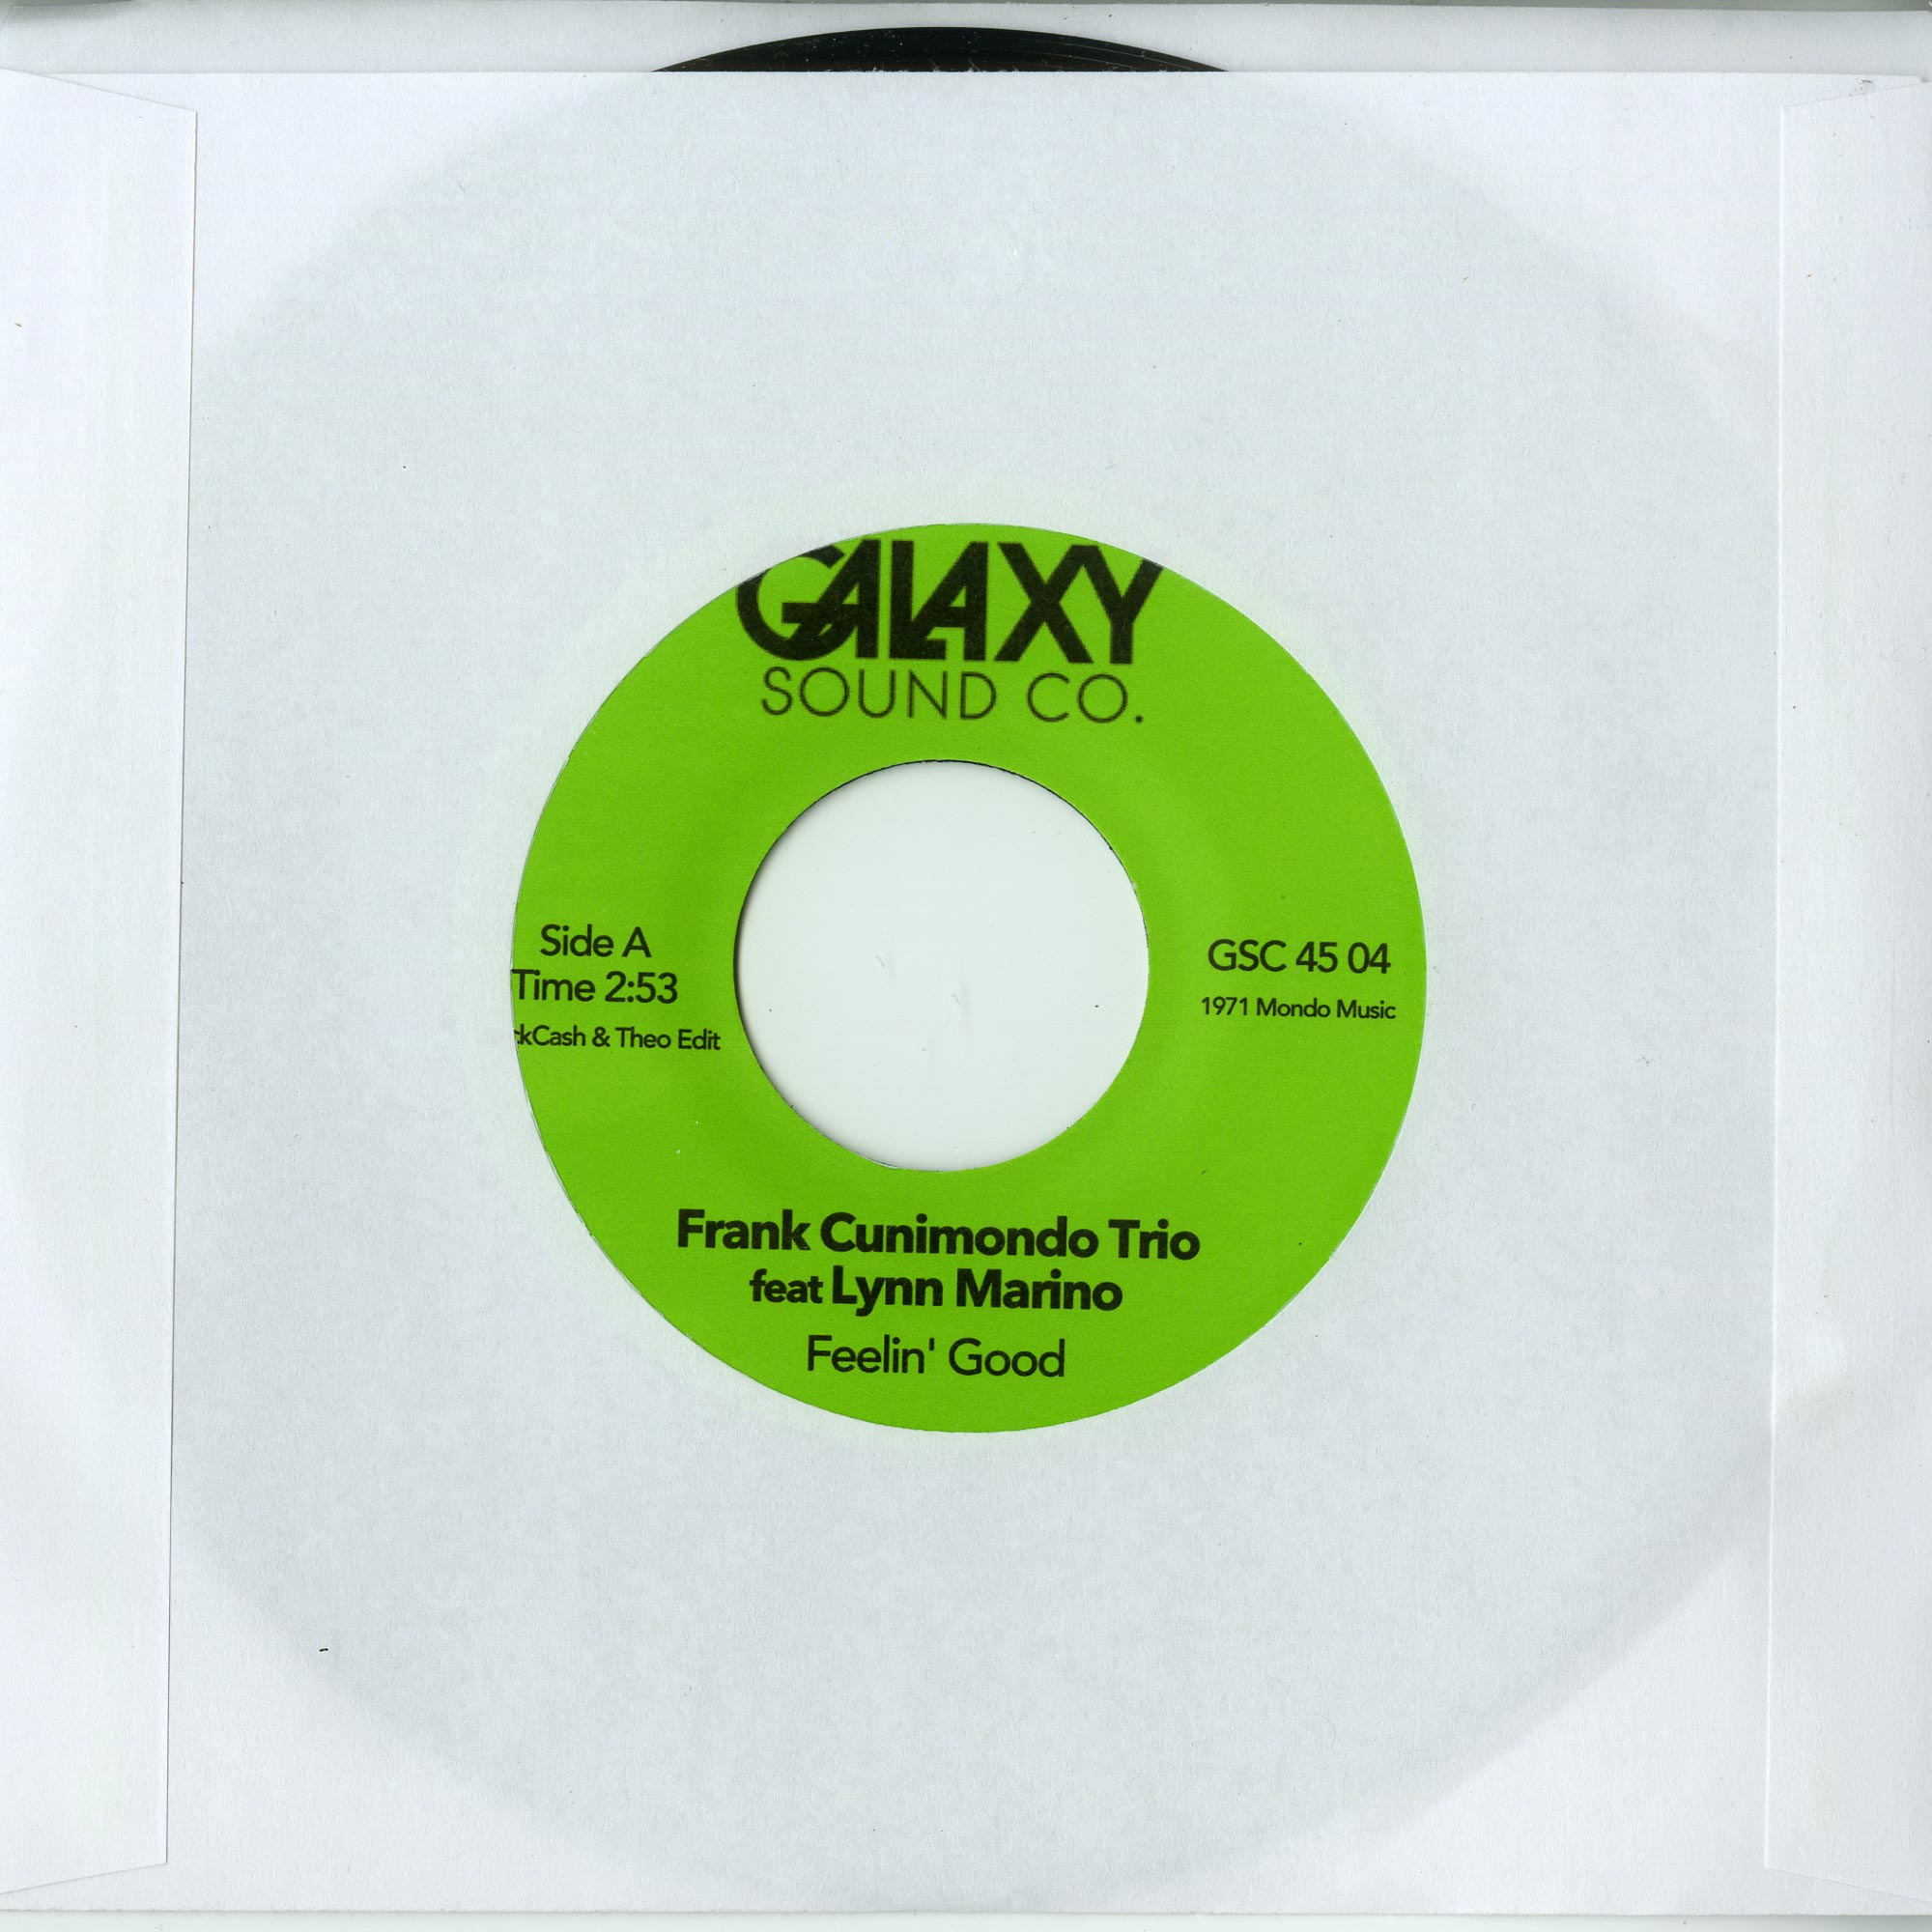 Various Artists - GALAXY VOL. 4